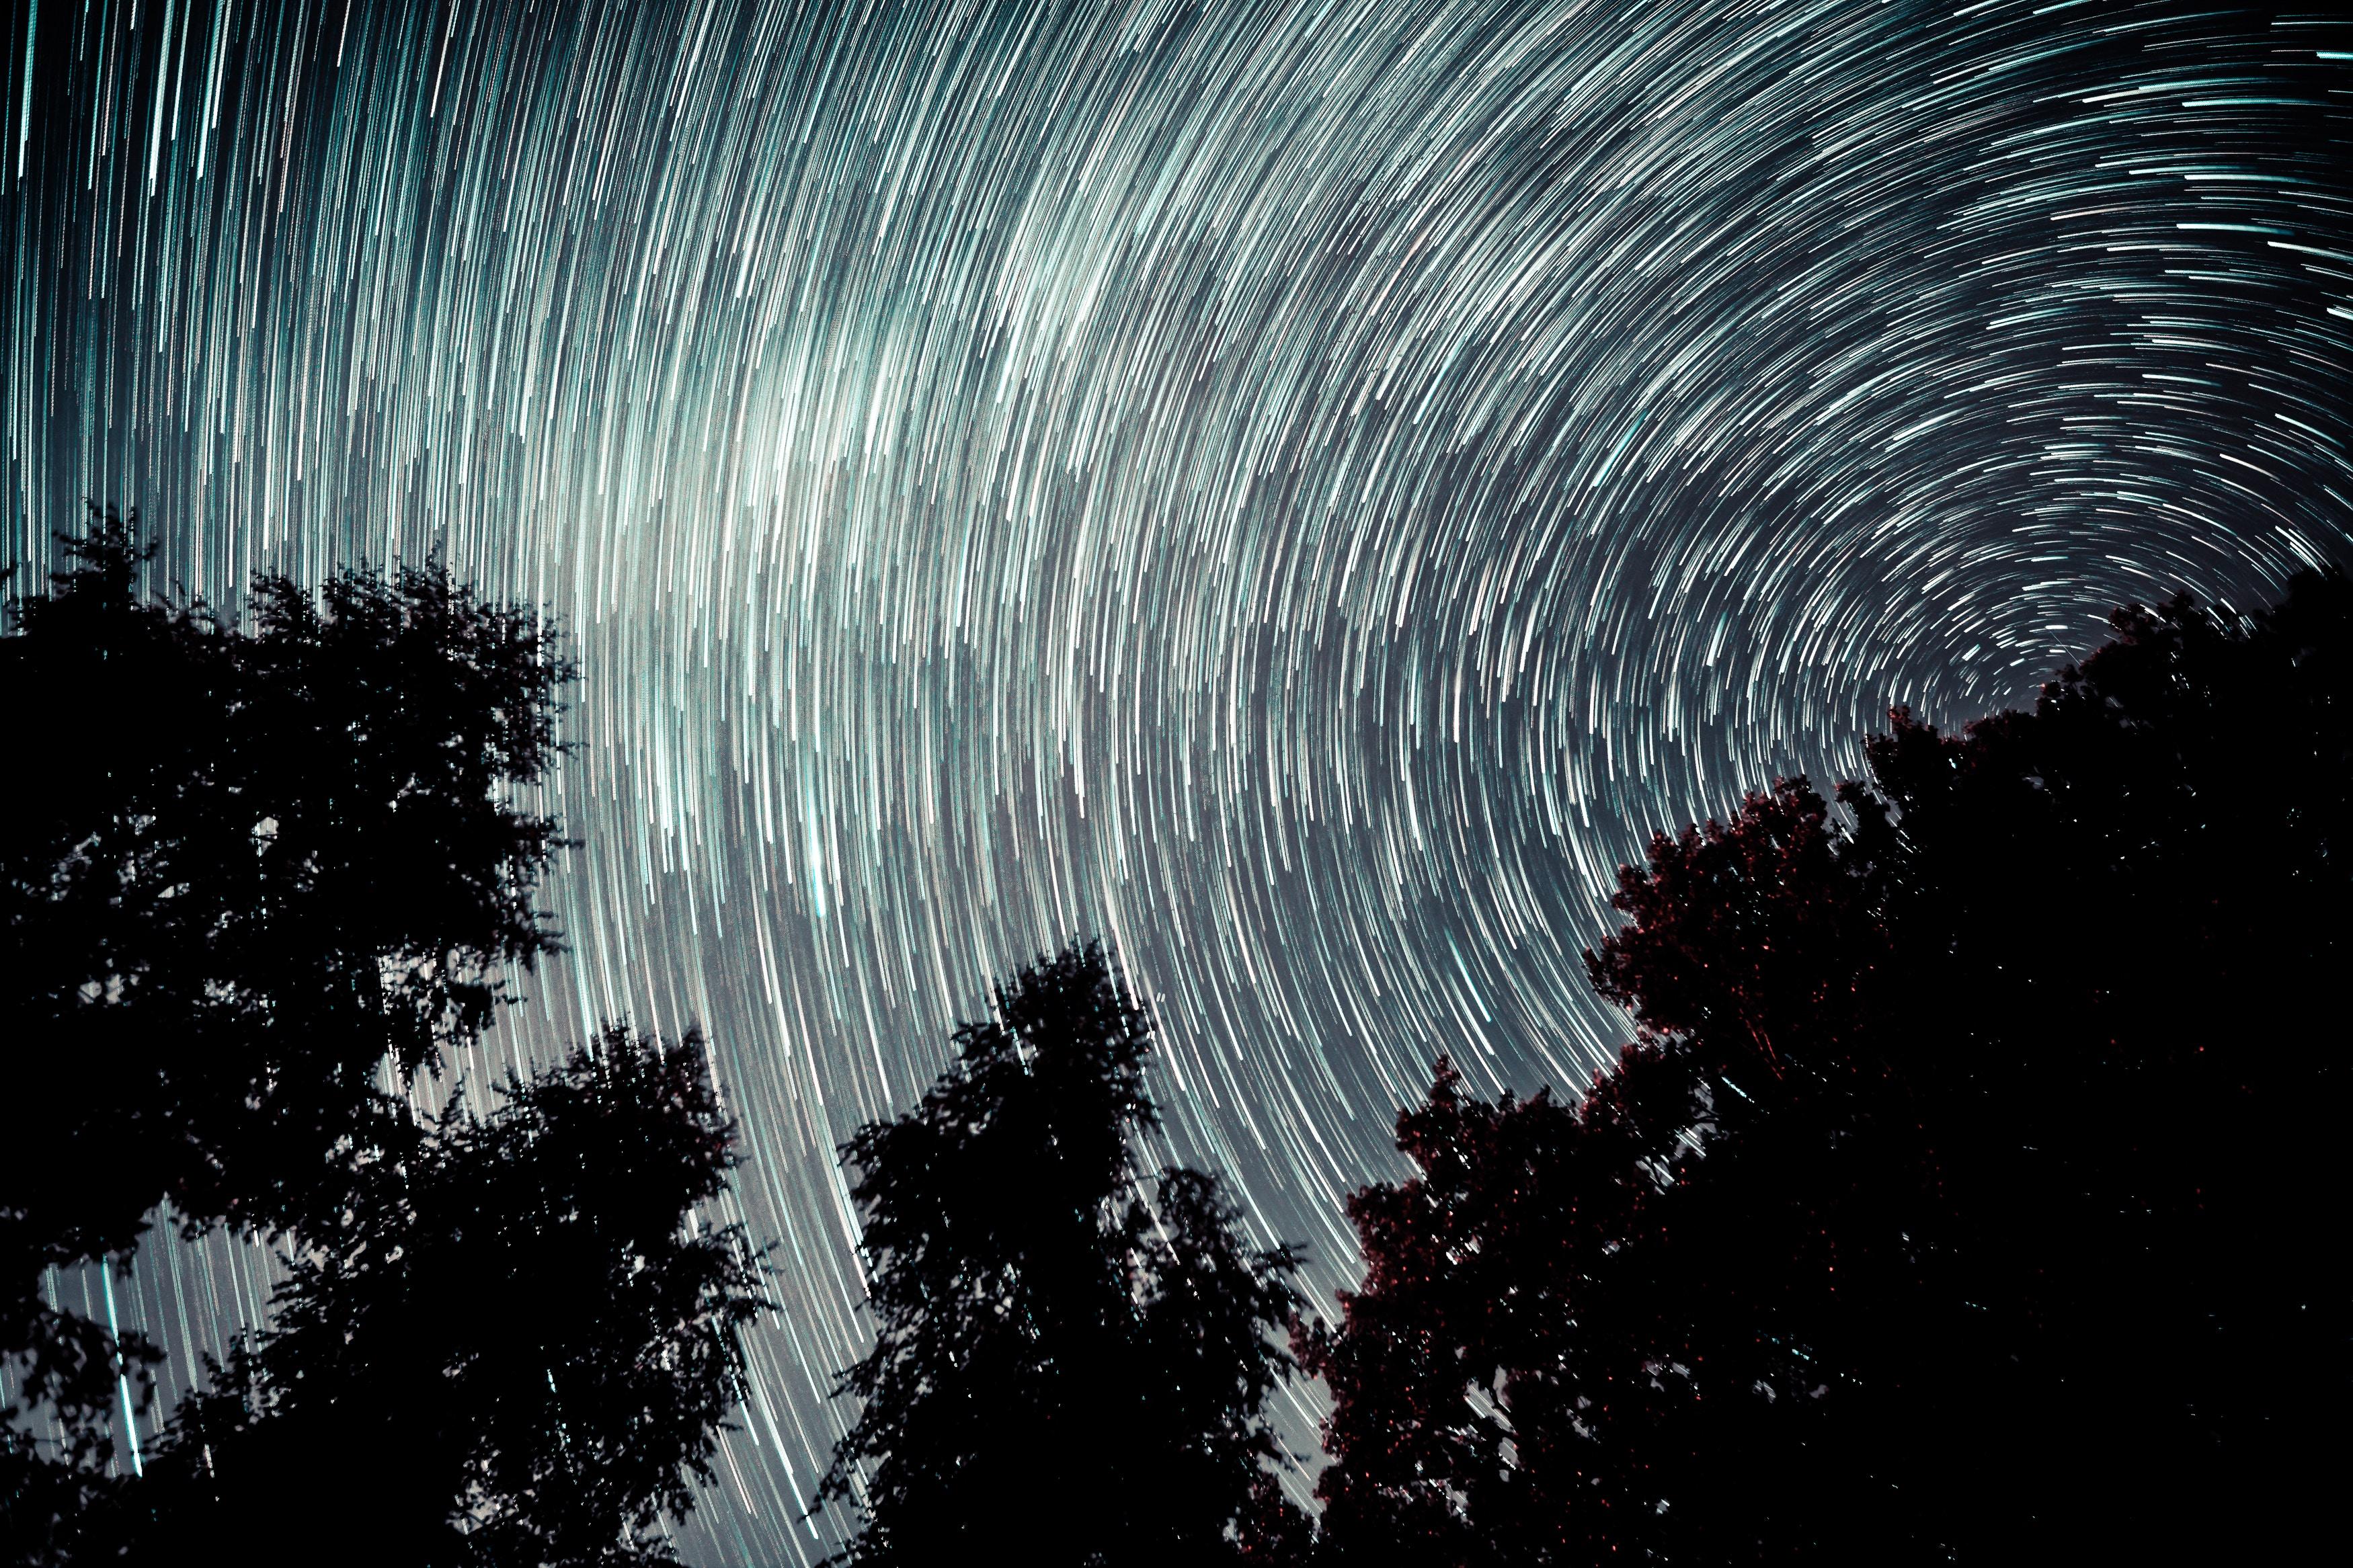 timelapse photography of starry sky